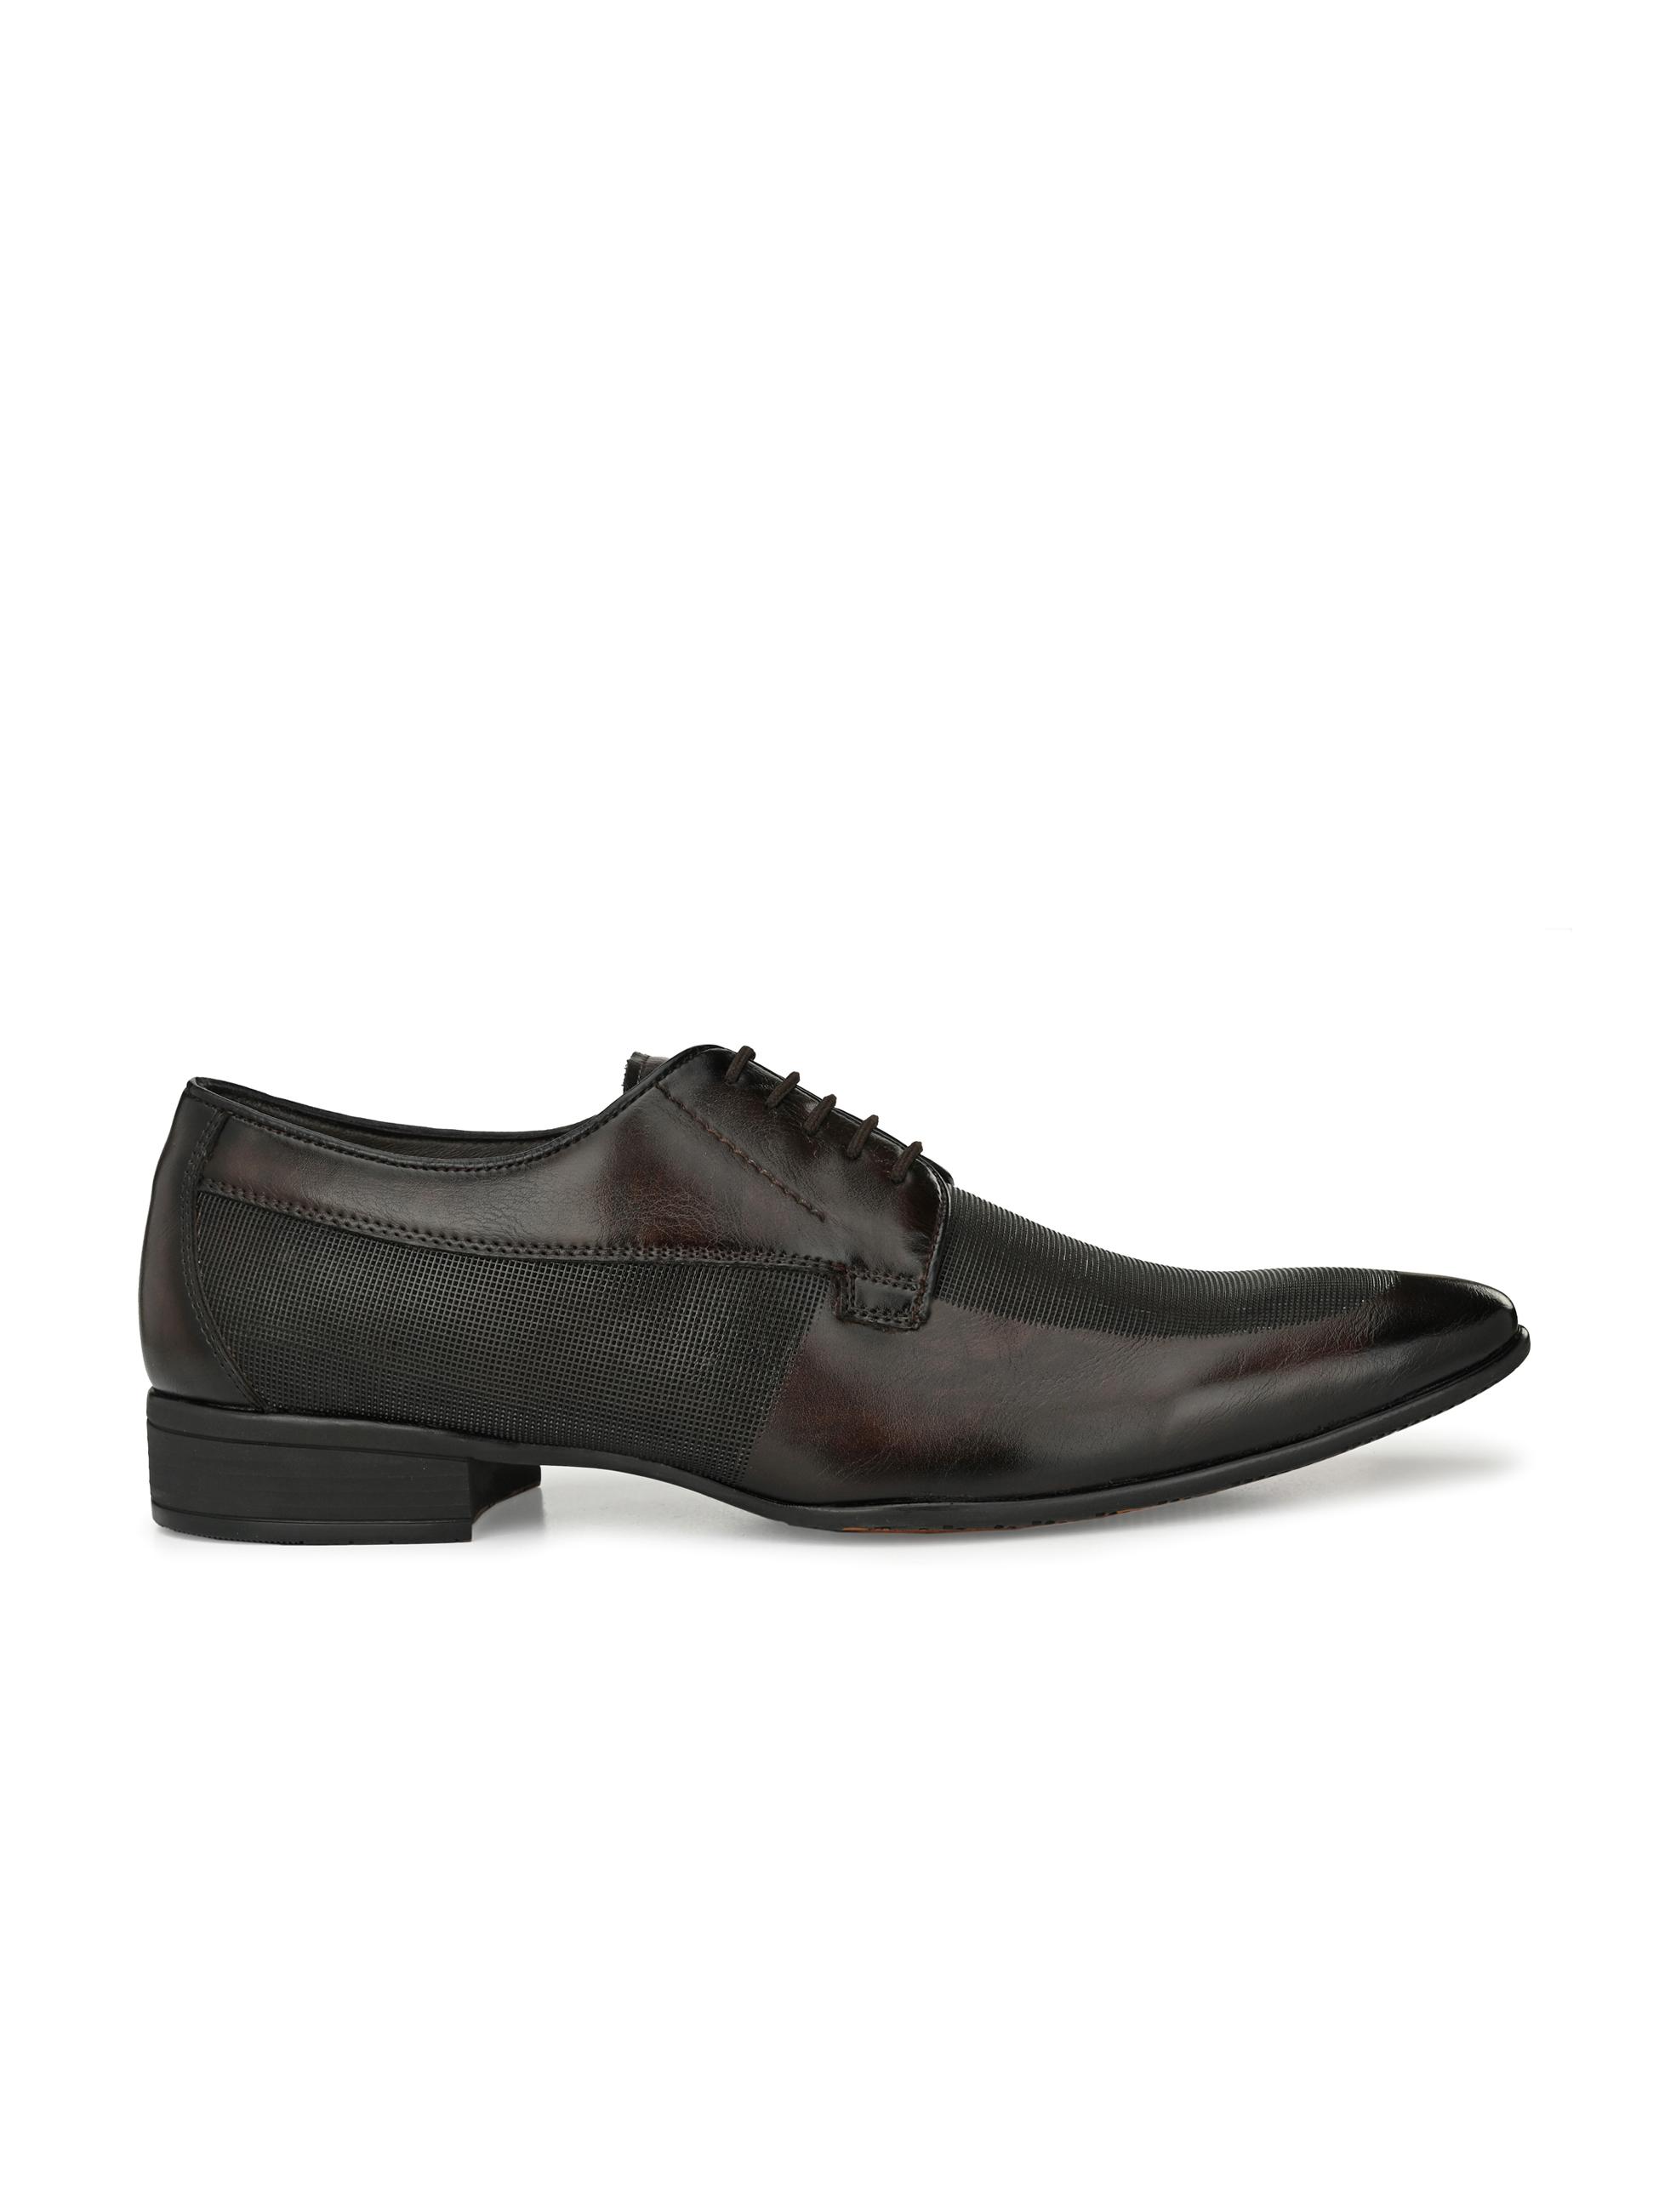 Hitz | Hitz Brown Coco Formal Derby Shoes For Men